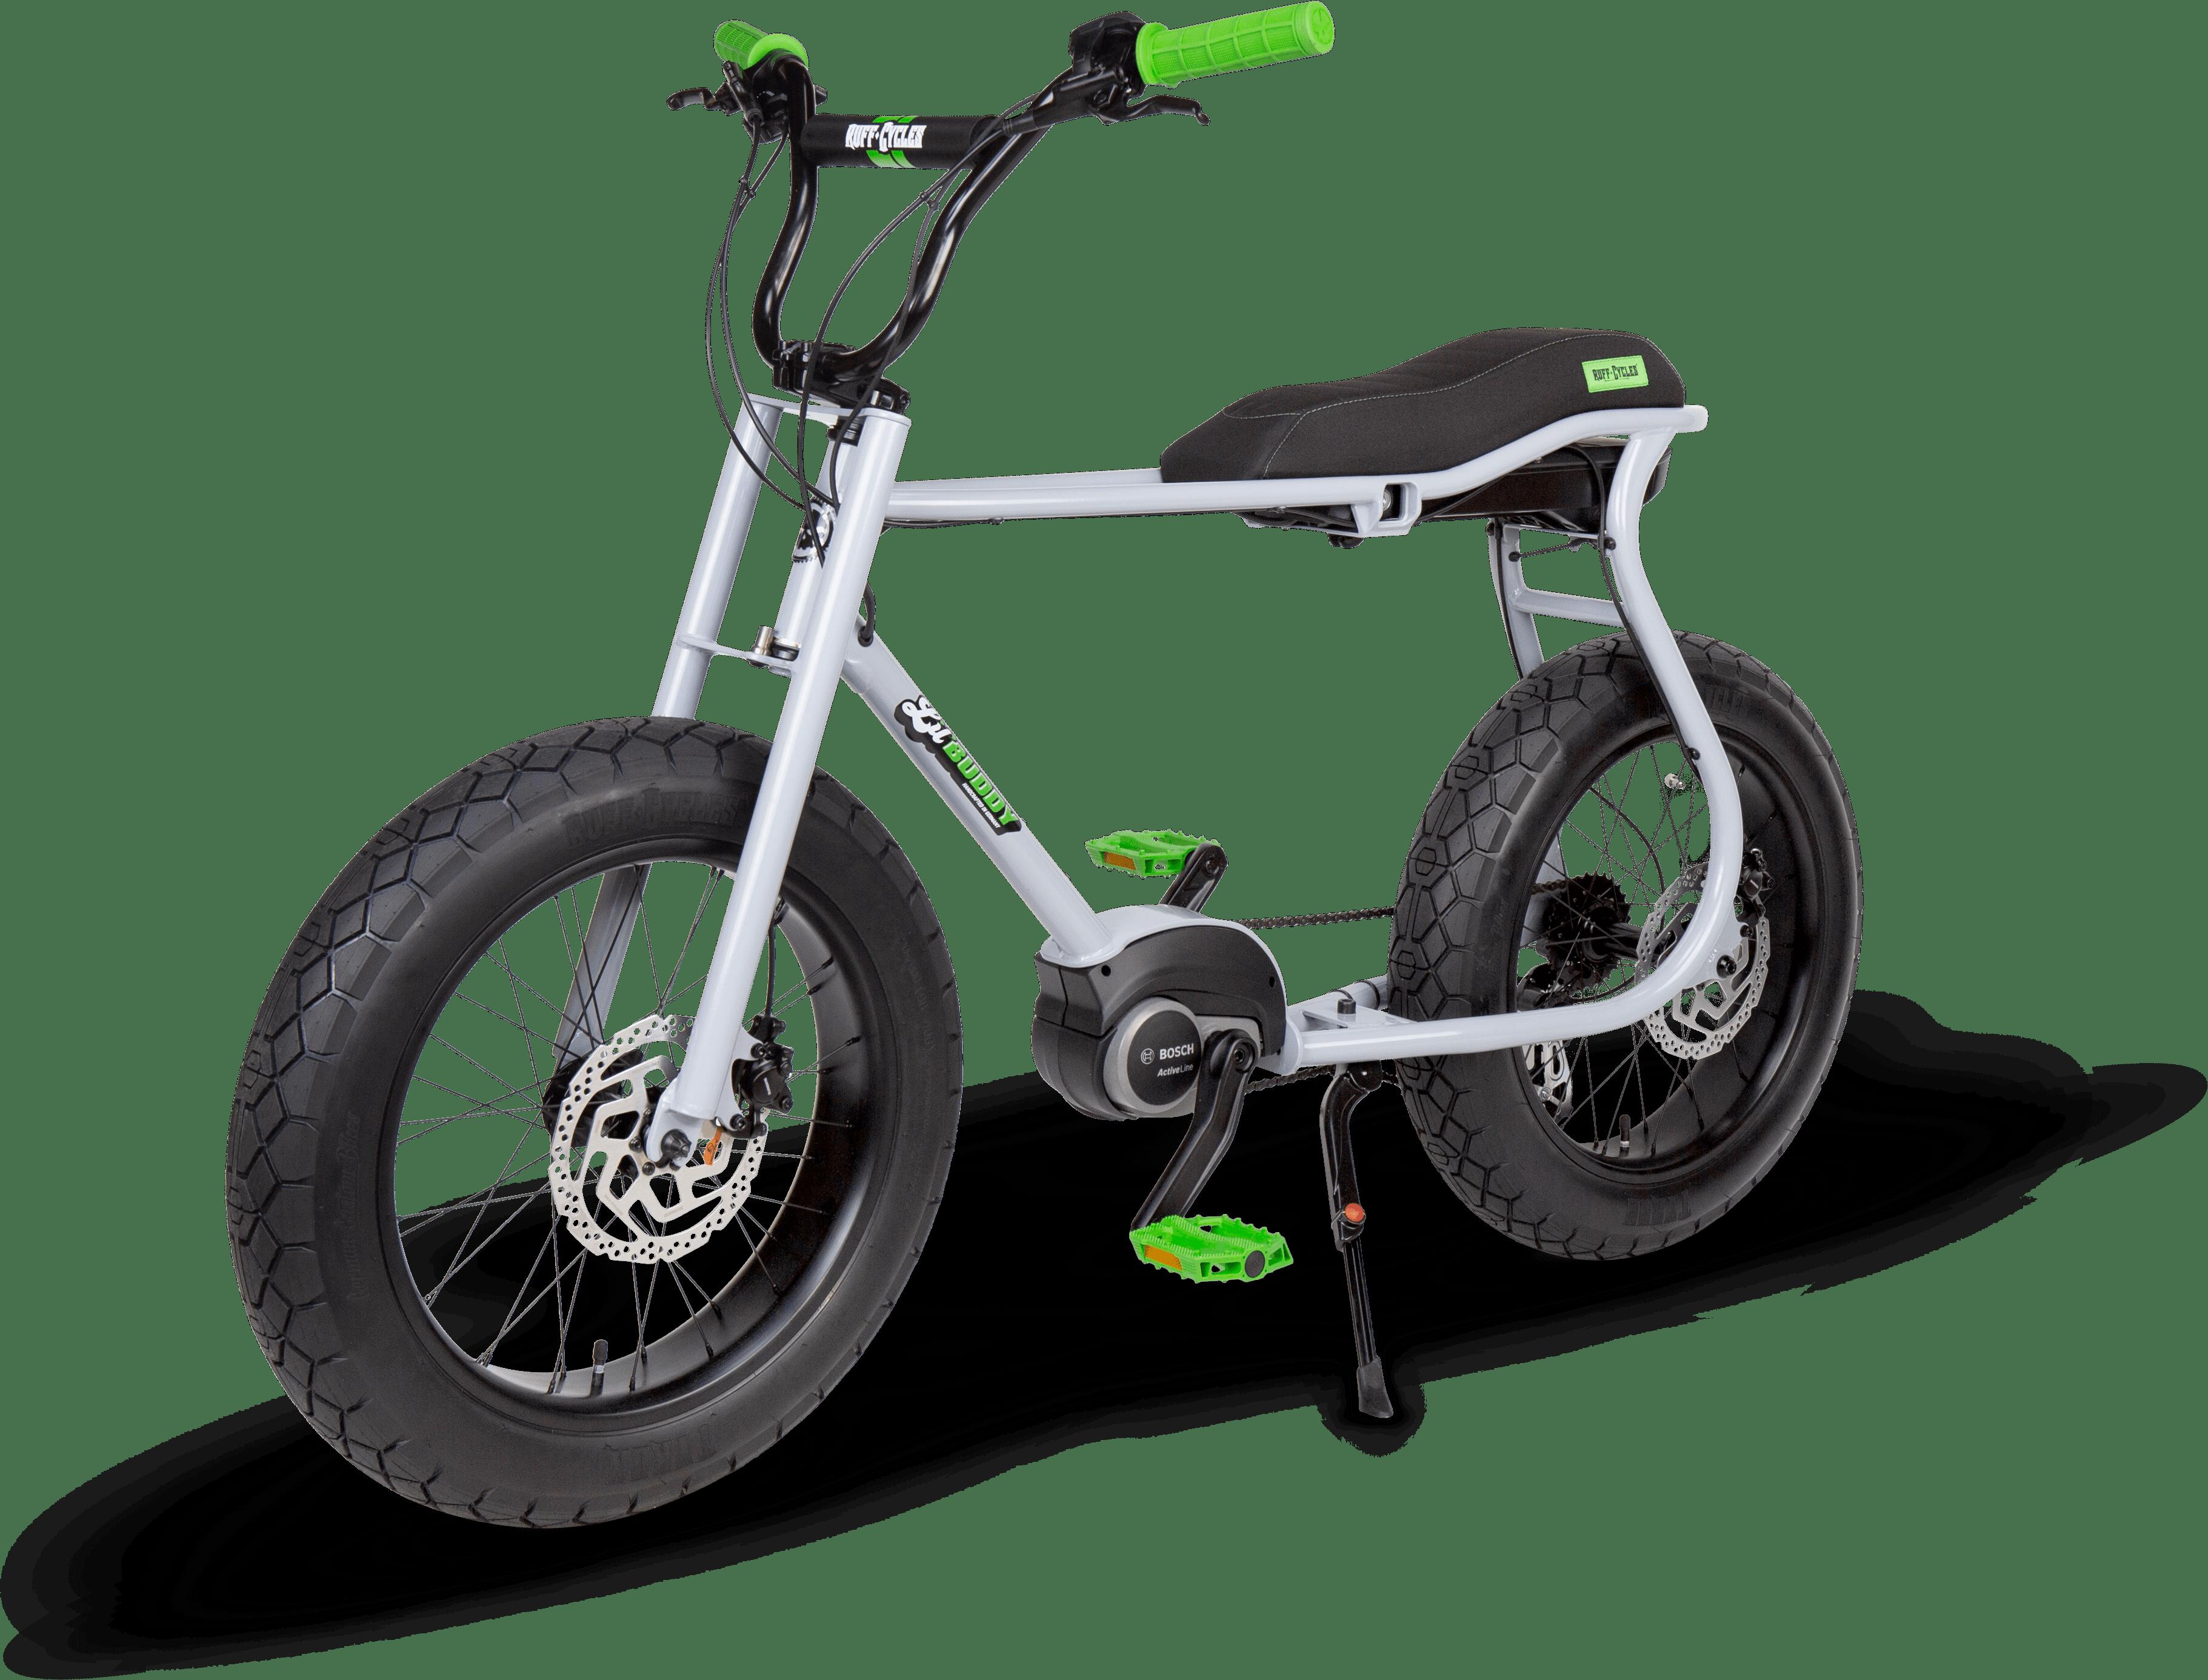 RUFF CYCLES Lil Buddy 2021 Silvergrey - Angle Front